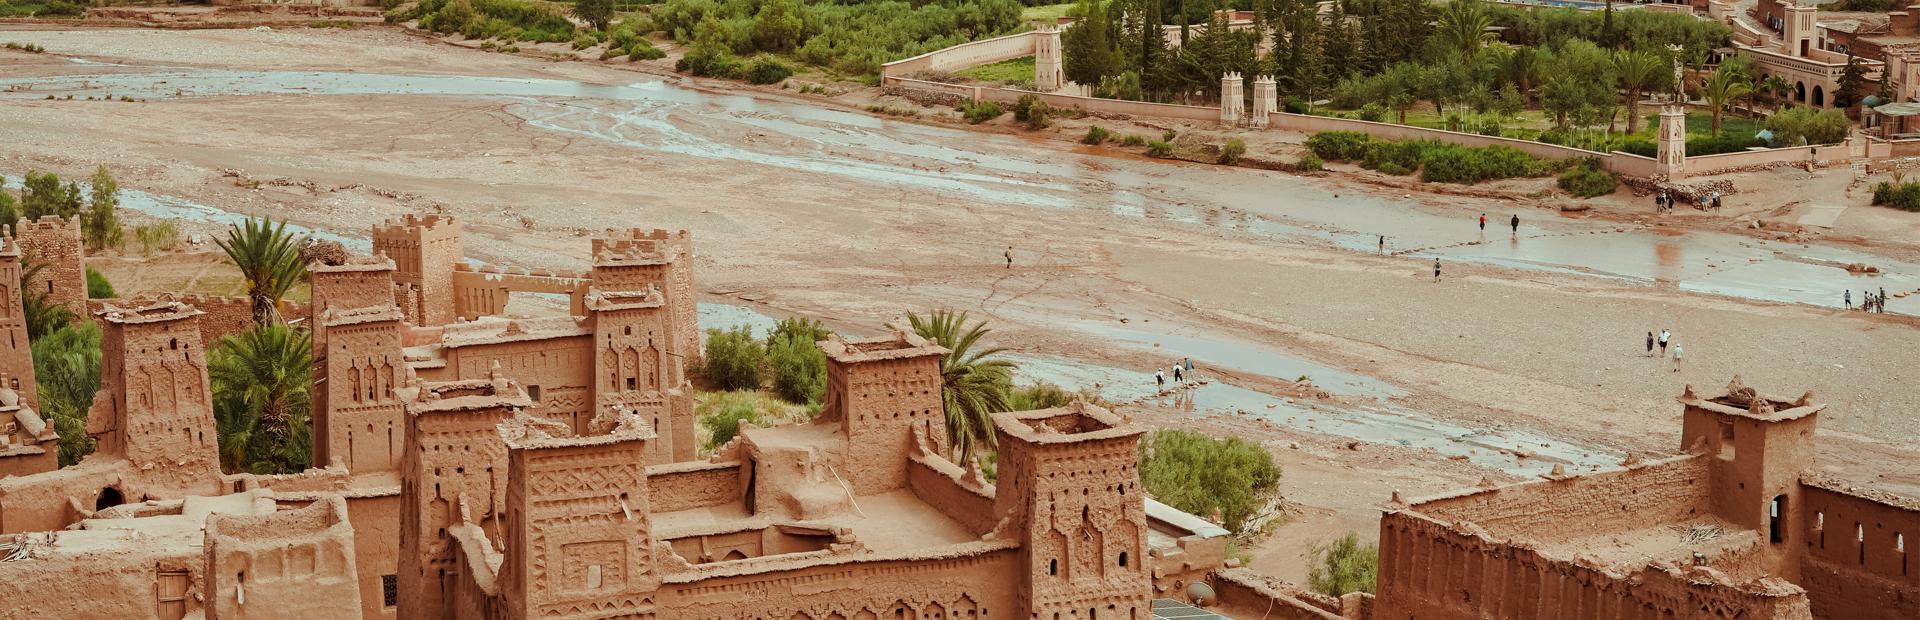 MoroccoAitBenhaddou_toa-heftiba-pcbSQTQr2-I-unsplash copy